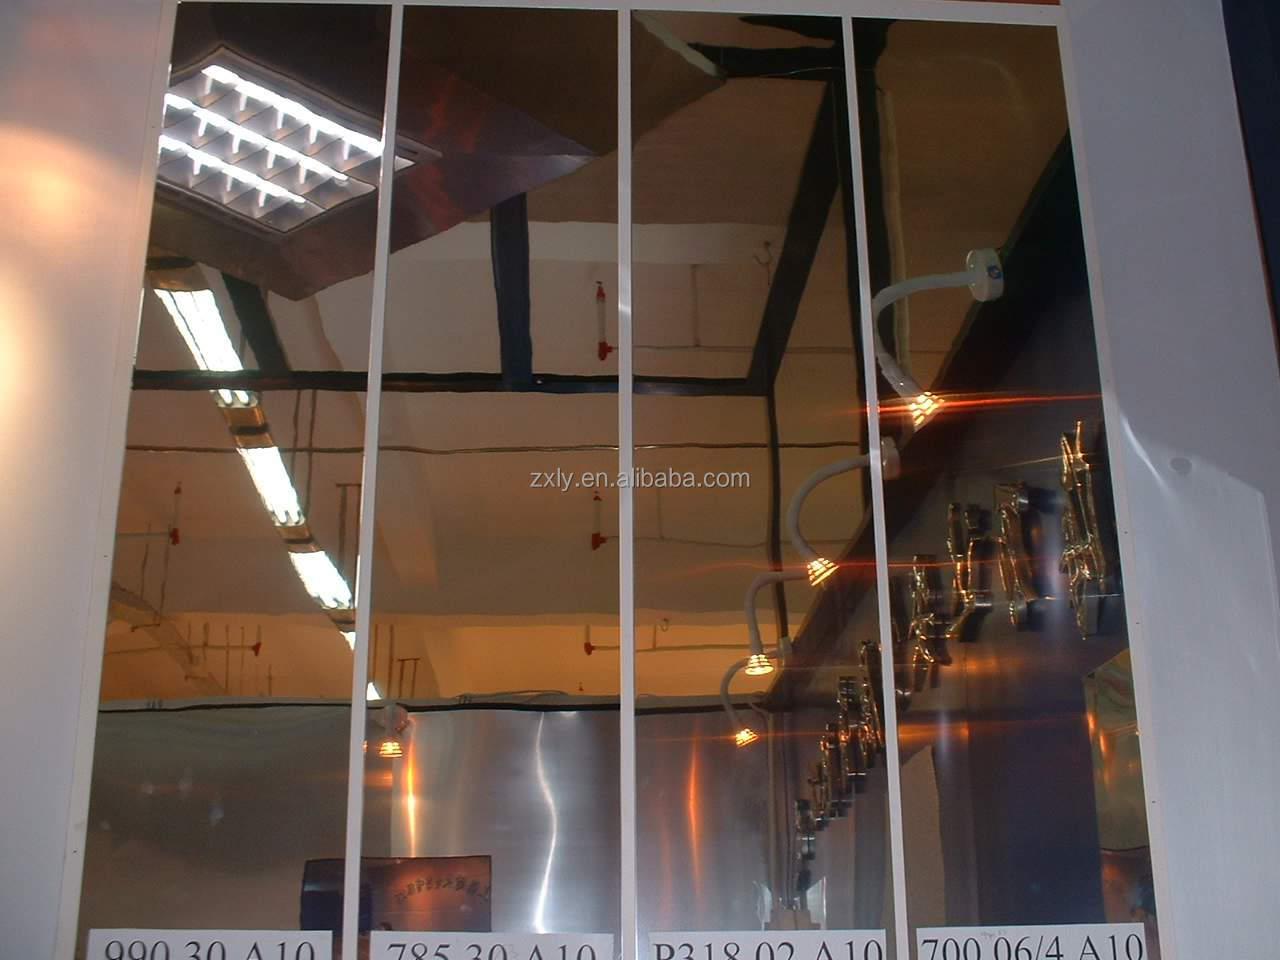 025mm mirror reflective aluminum sheet for ceiling tiles 1060 025mm mirror reflective aluminum sheet for ceiling tiles 1060 alloy doublecrazyfo Images